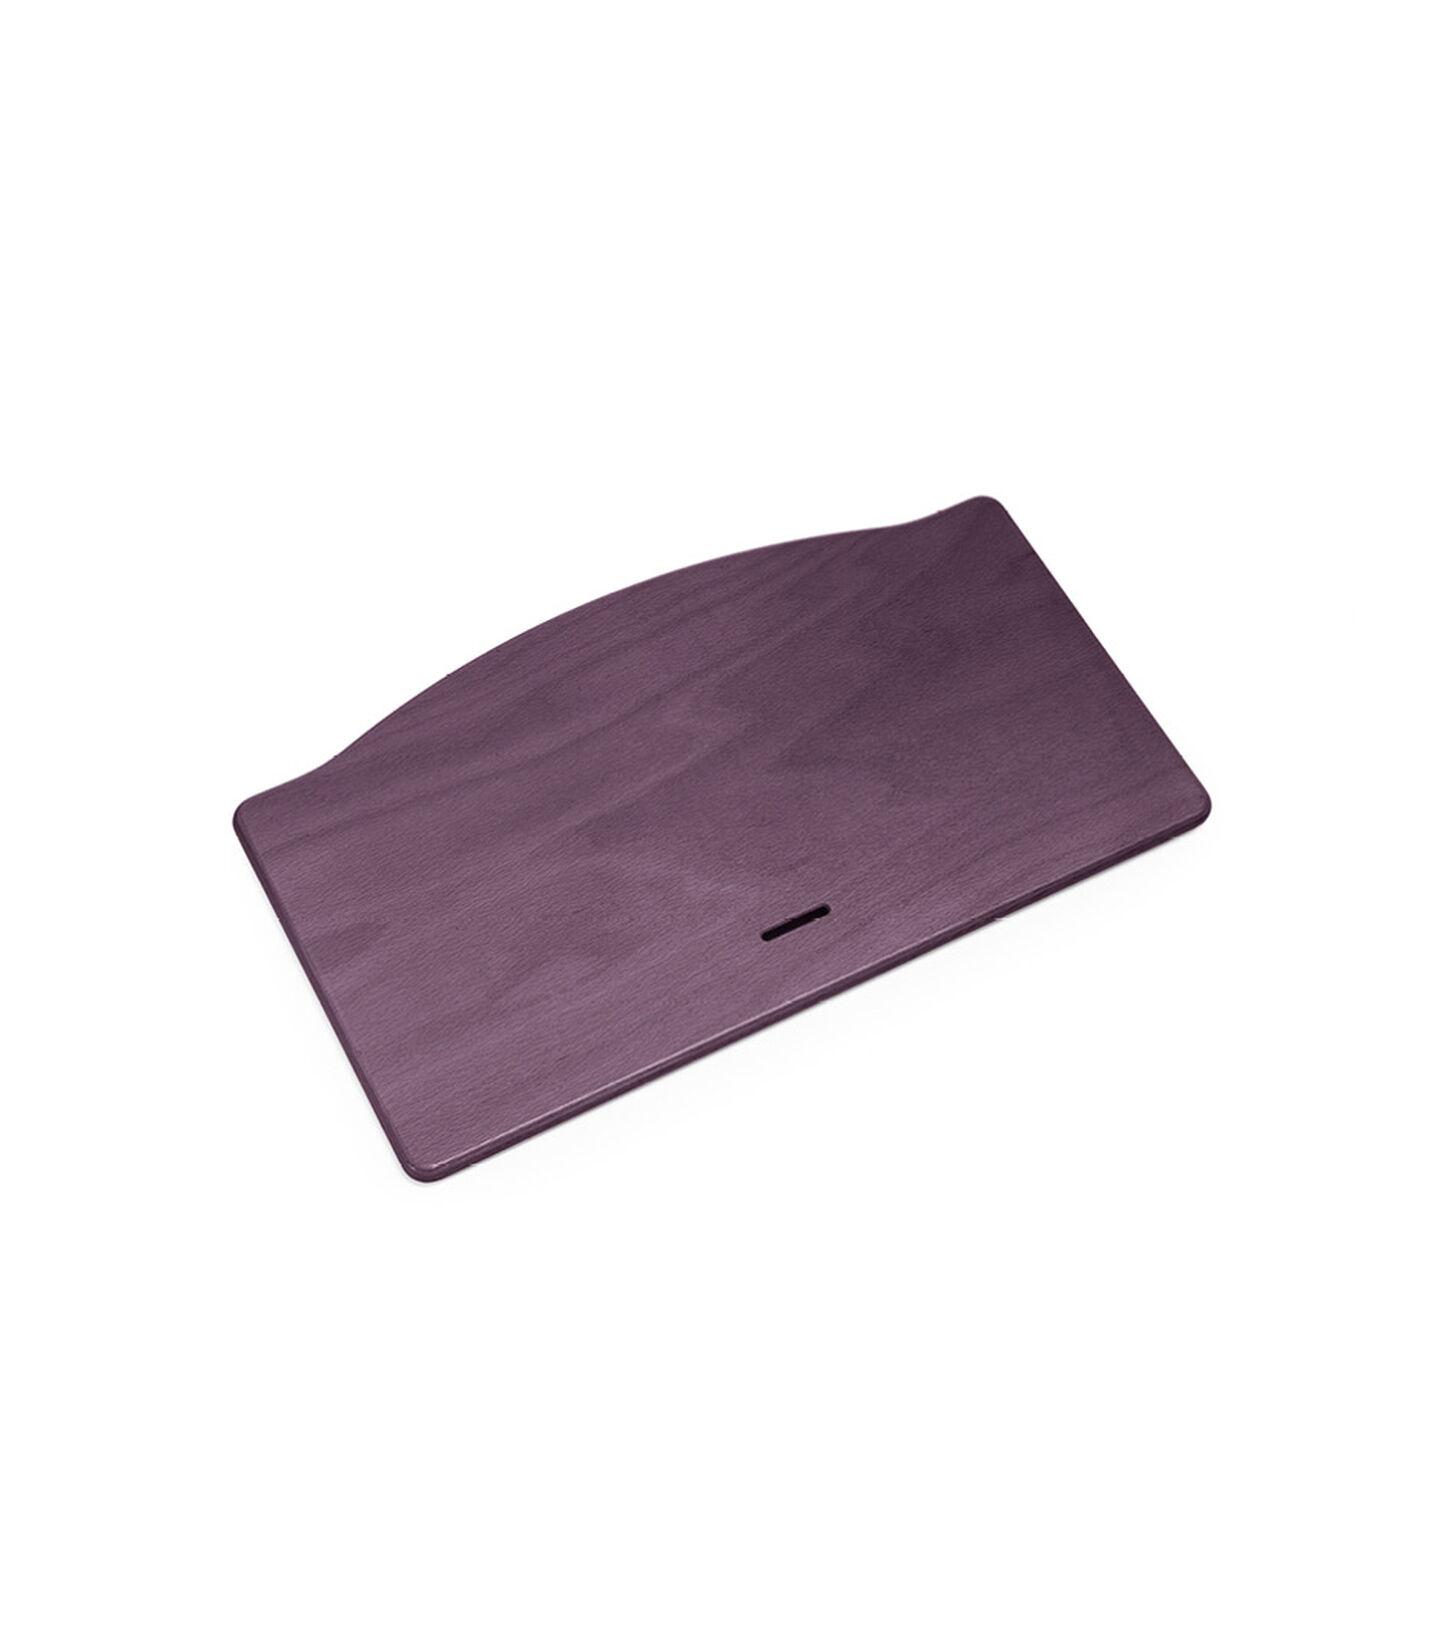 Tripp Trapp Seat plate Plum Purple (Spare part). view 2